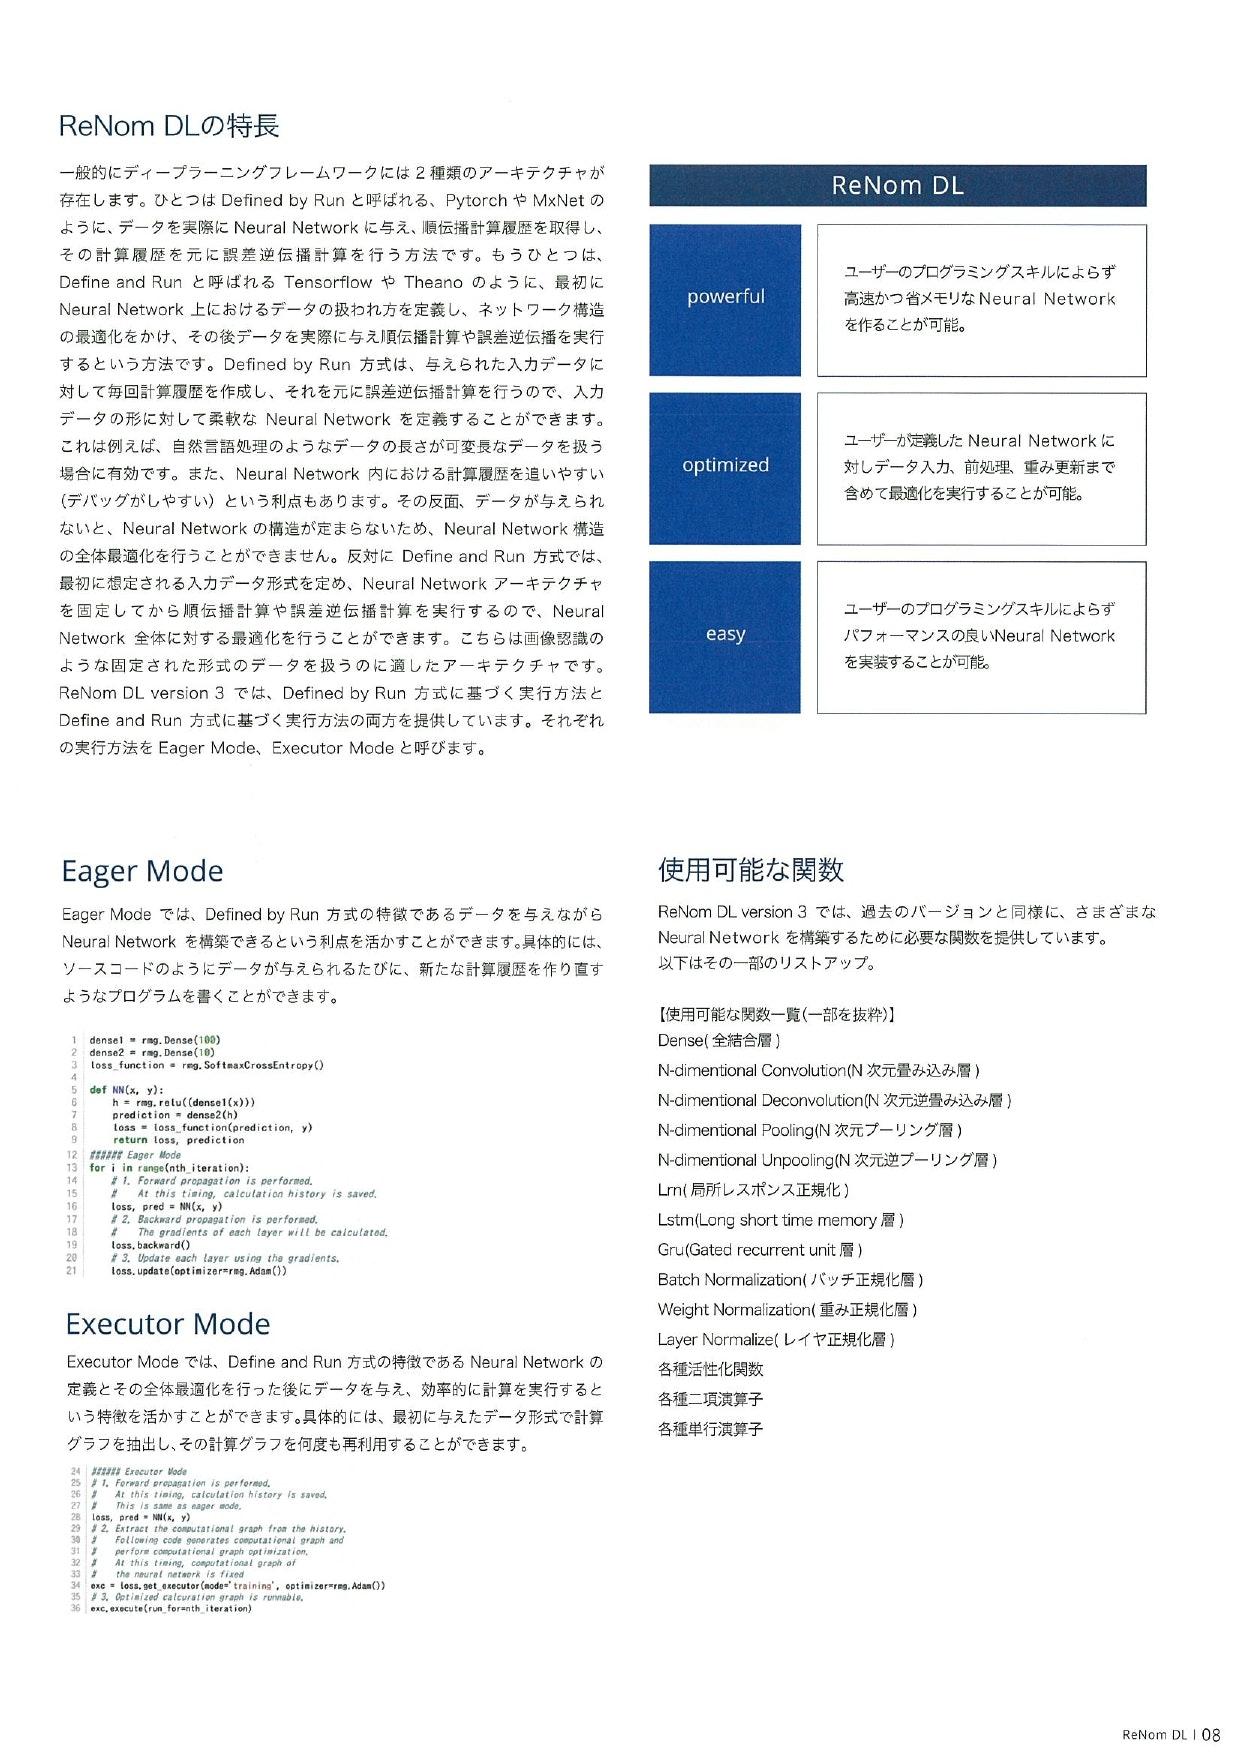 20190404155650_page-0023.jpg